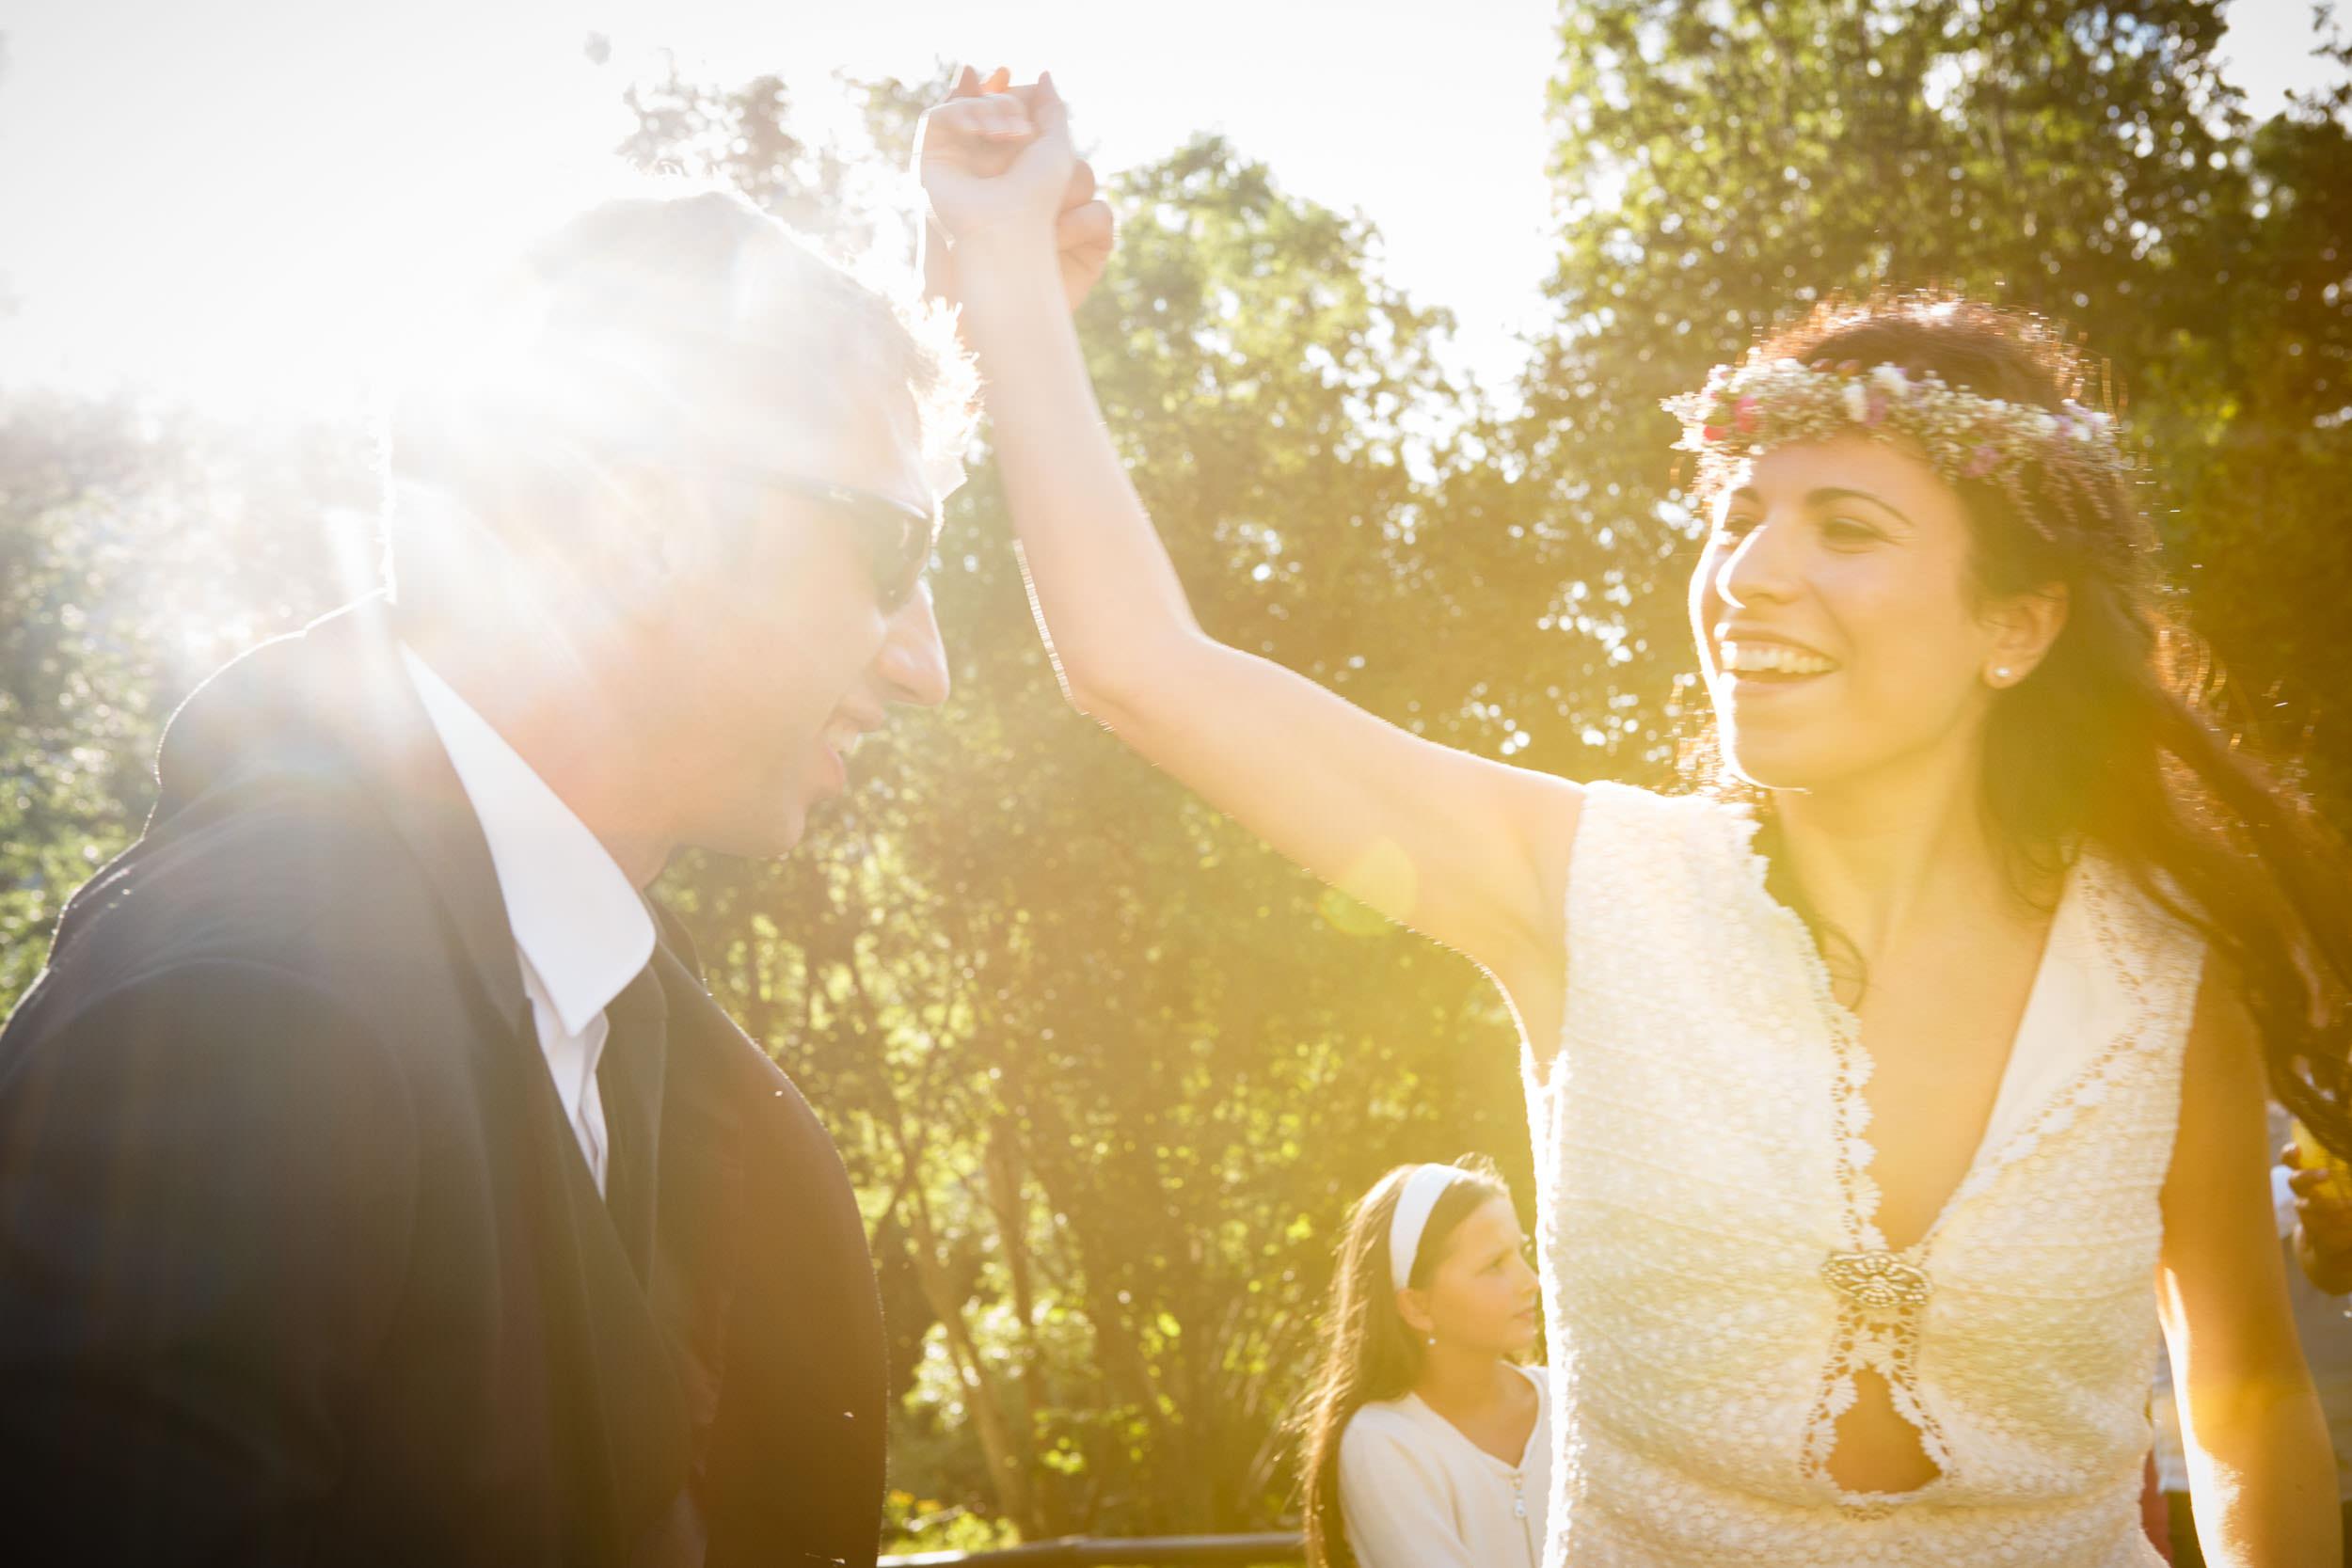 Wedding Photographer La Rioja Basque Country Spain - James Sturcke - sturcke.org_052.jpg